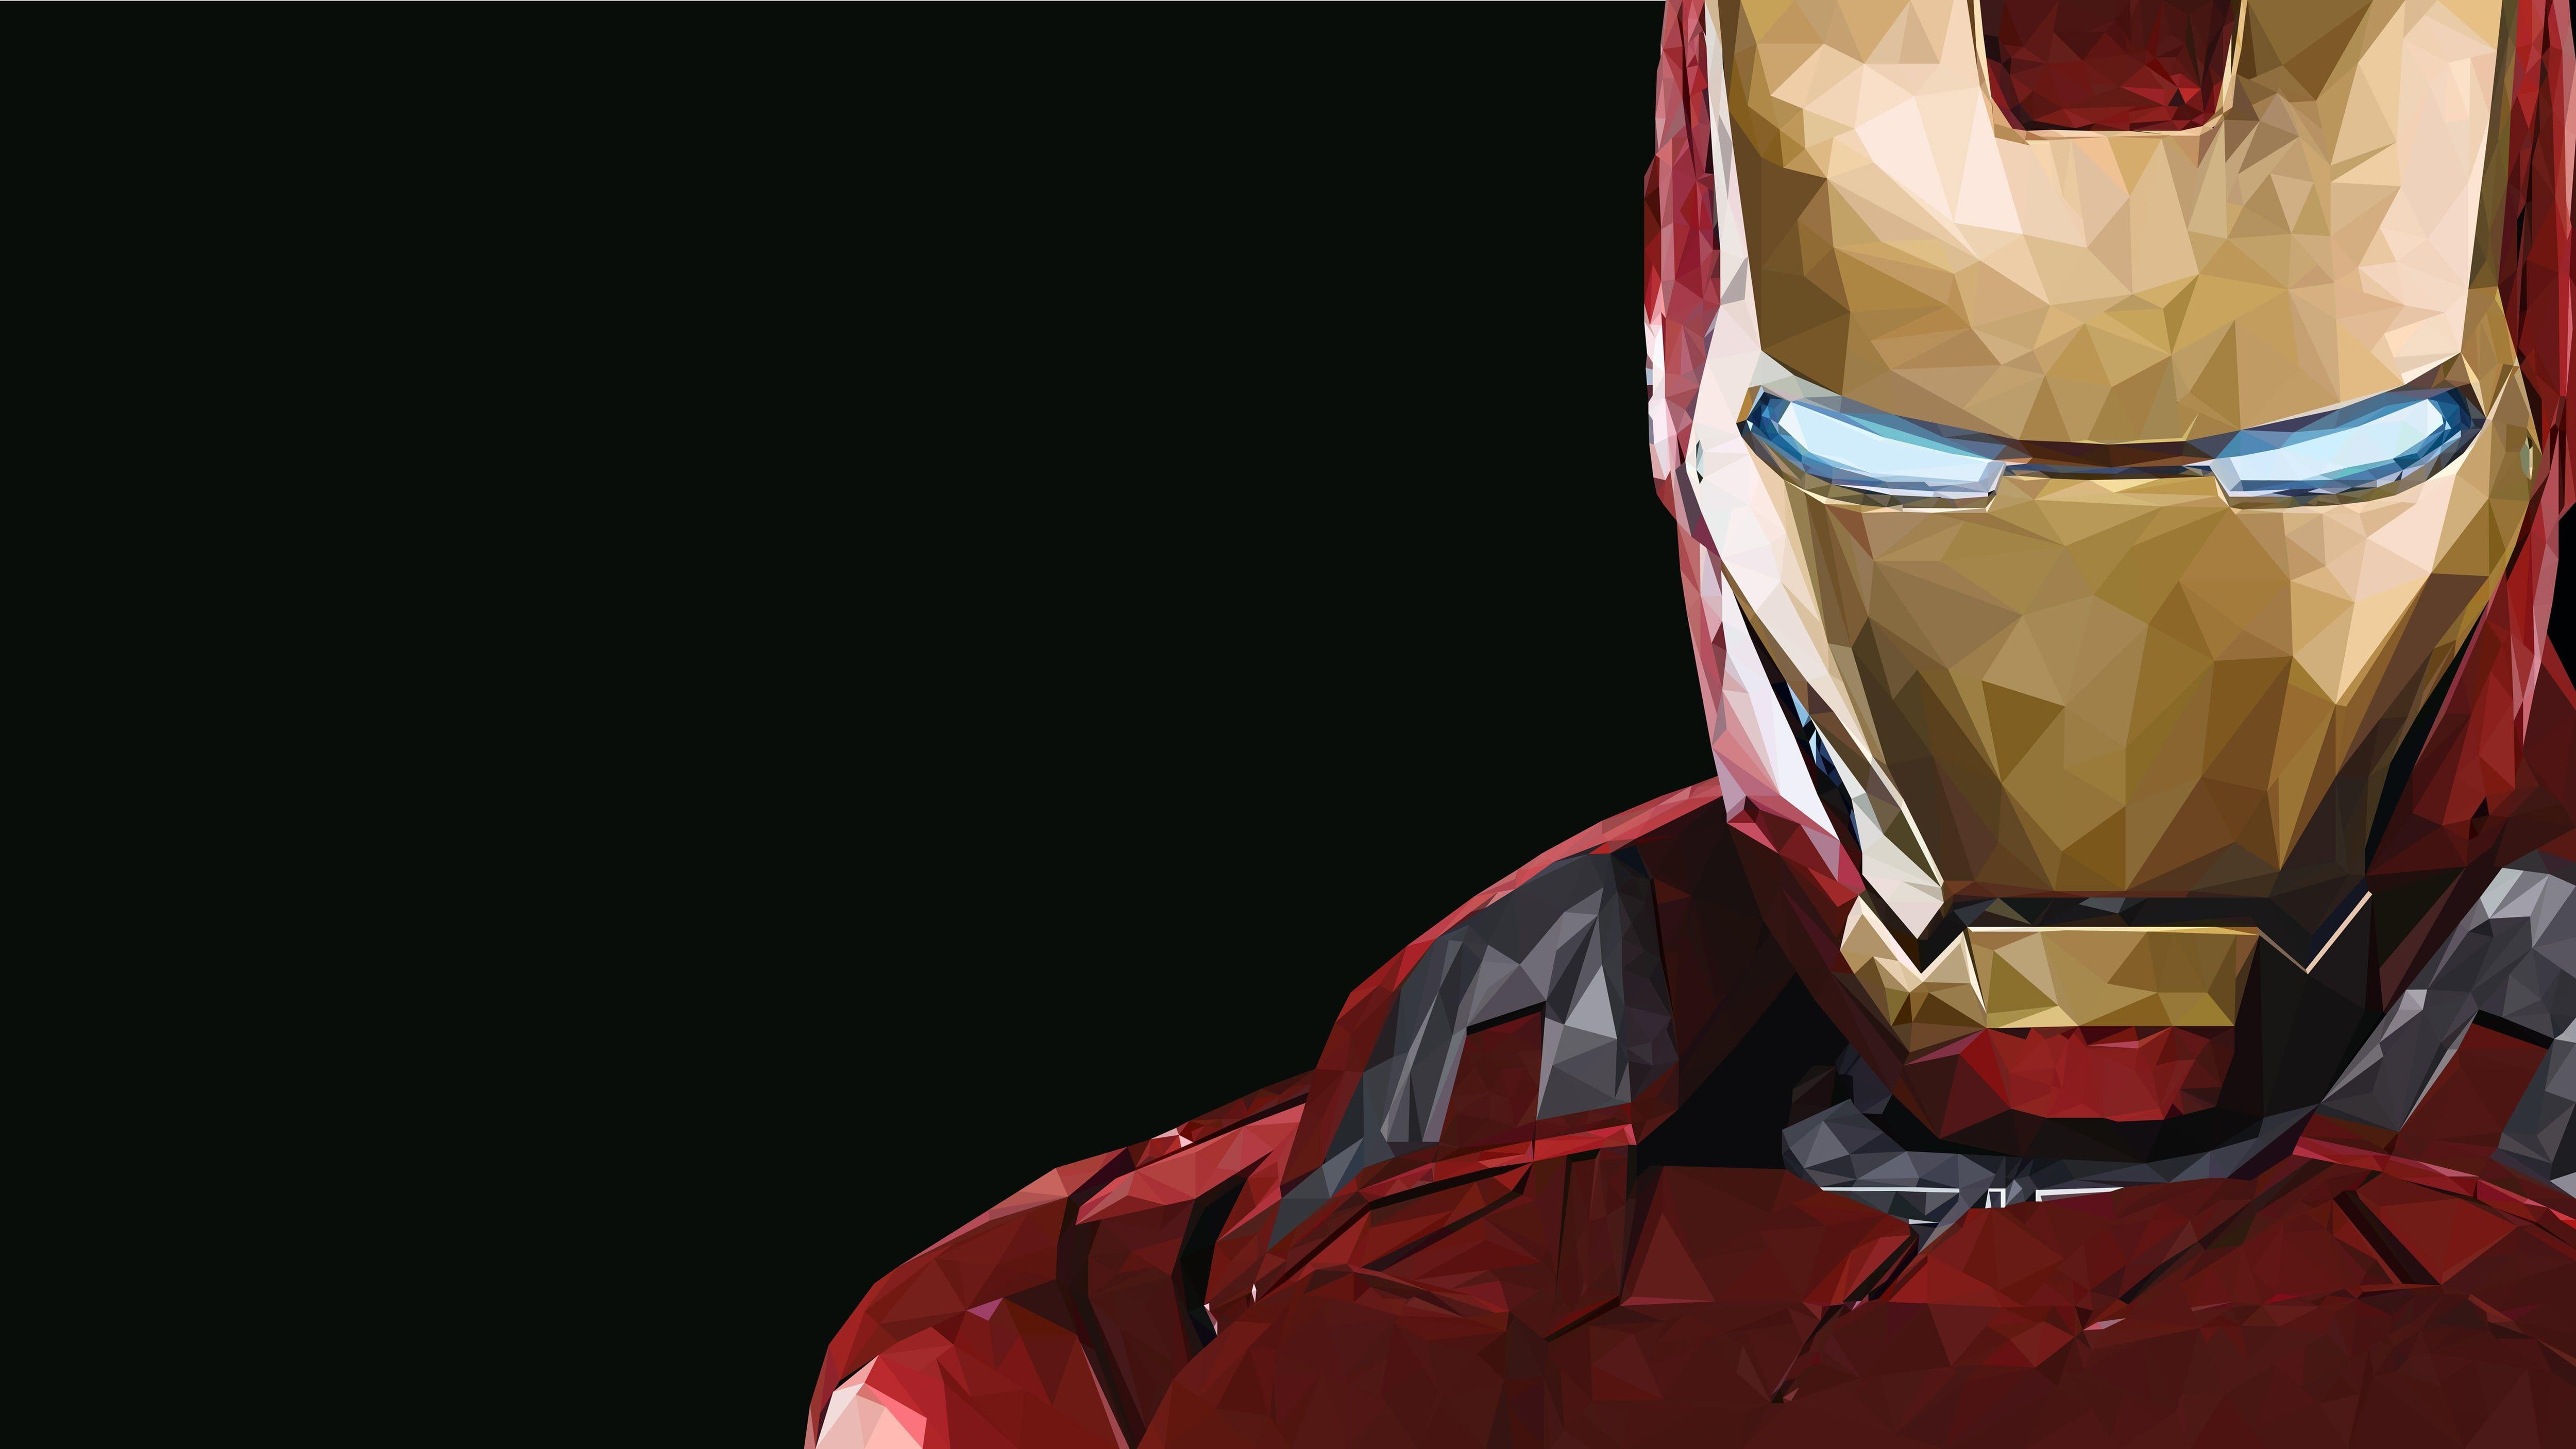 Iron Man Mark 43 Wallpaper Marvel Comics Copy Space Black Background Iron Man Iron Man Wallpaper Iron Man Mask